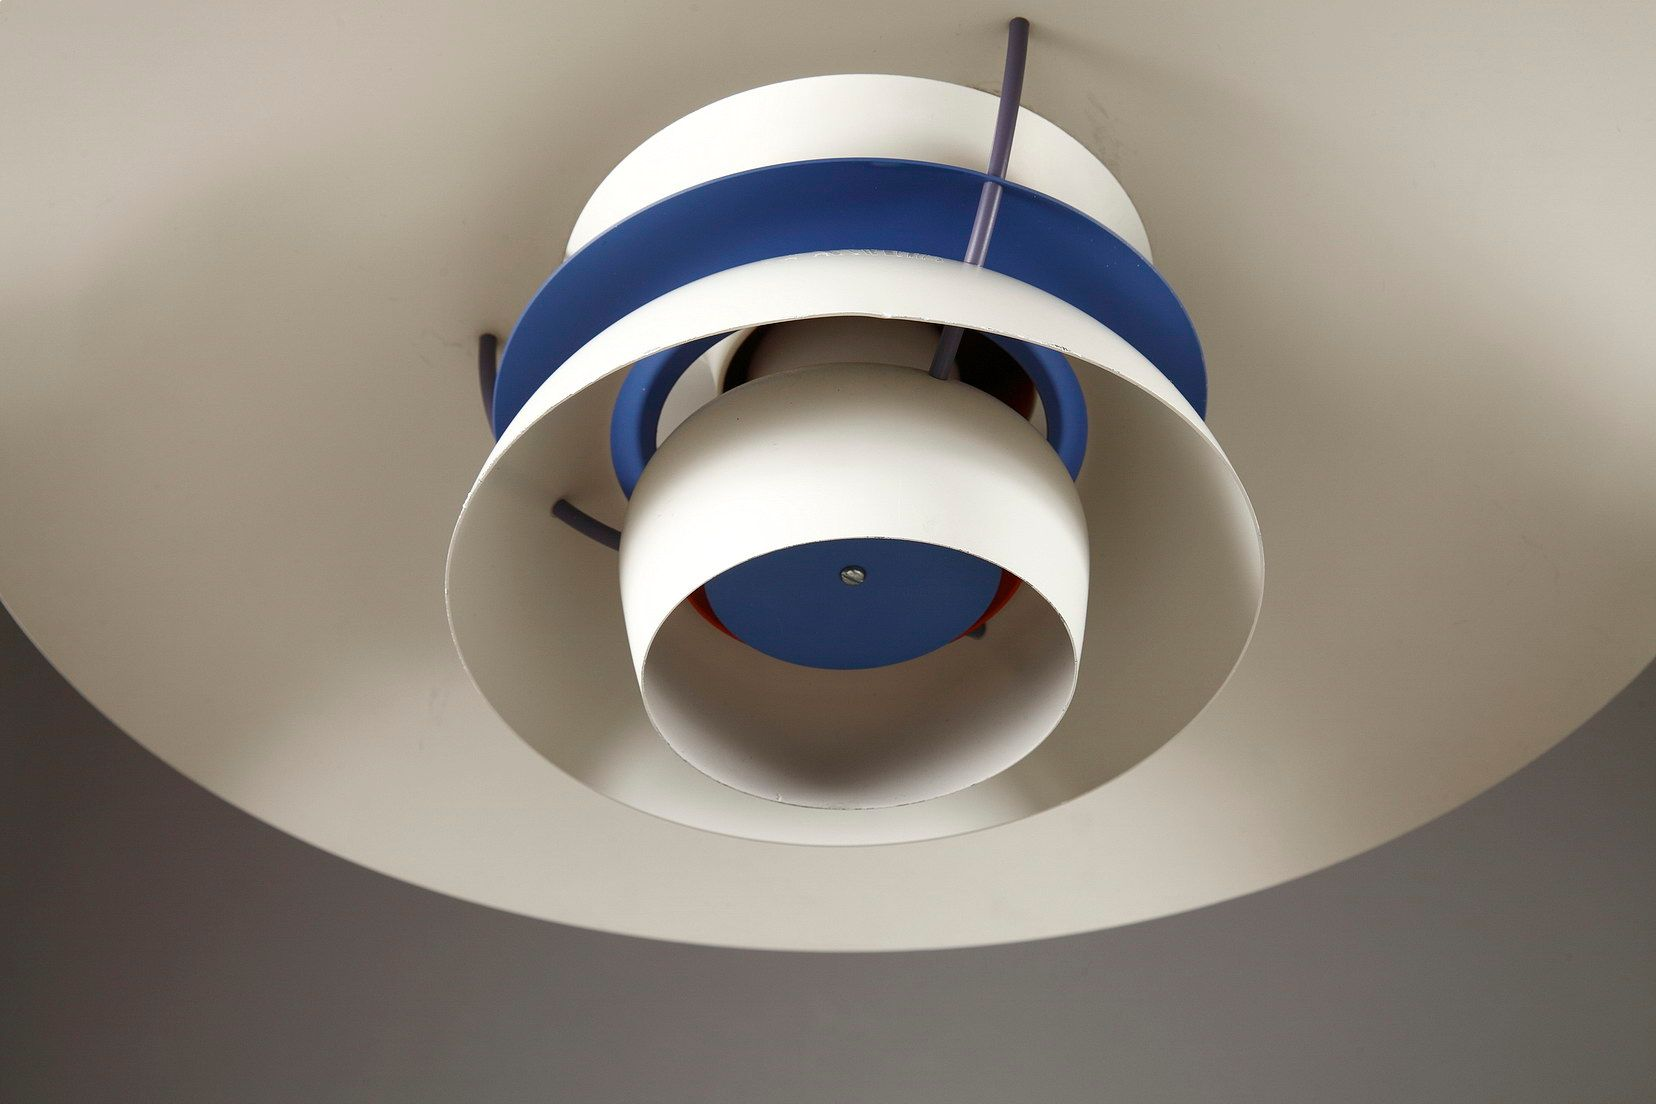 ph 5 pendant lamp by poul henningsen for louis poulsen for. Black Bedroom Furniture Sets. Home Design Ideas